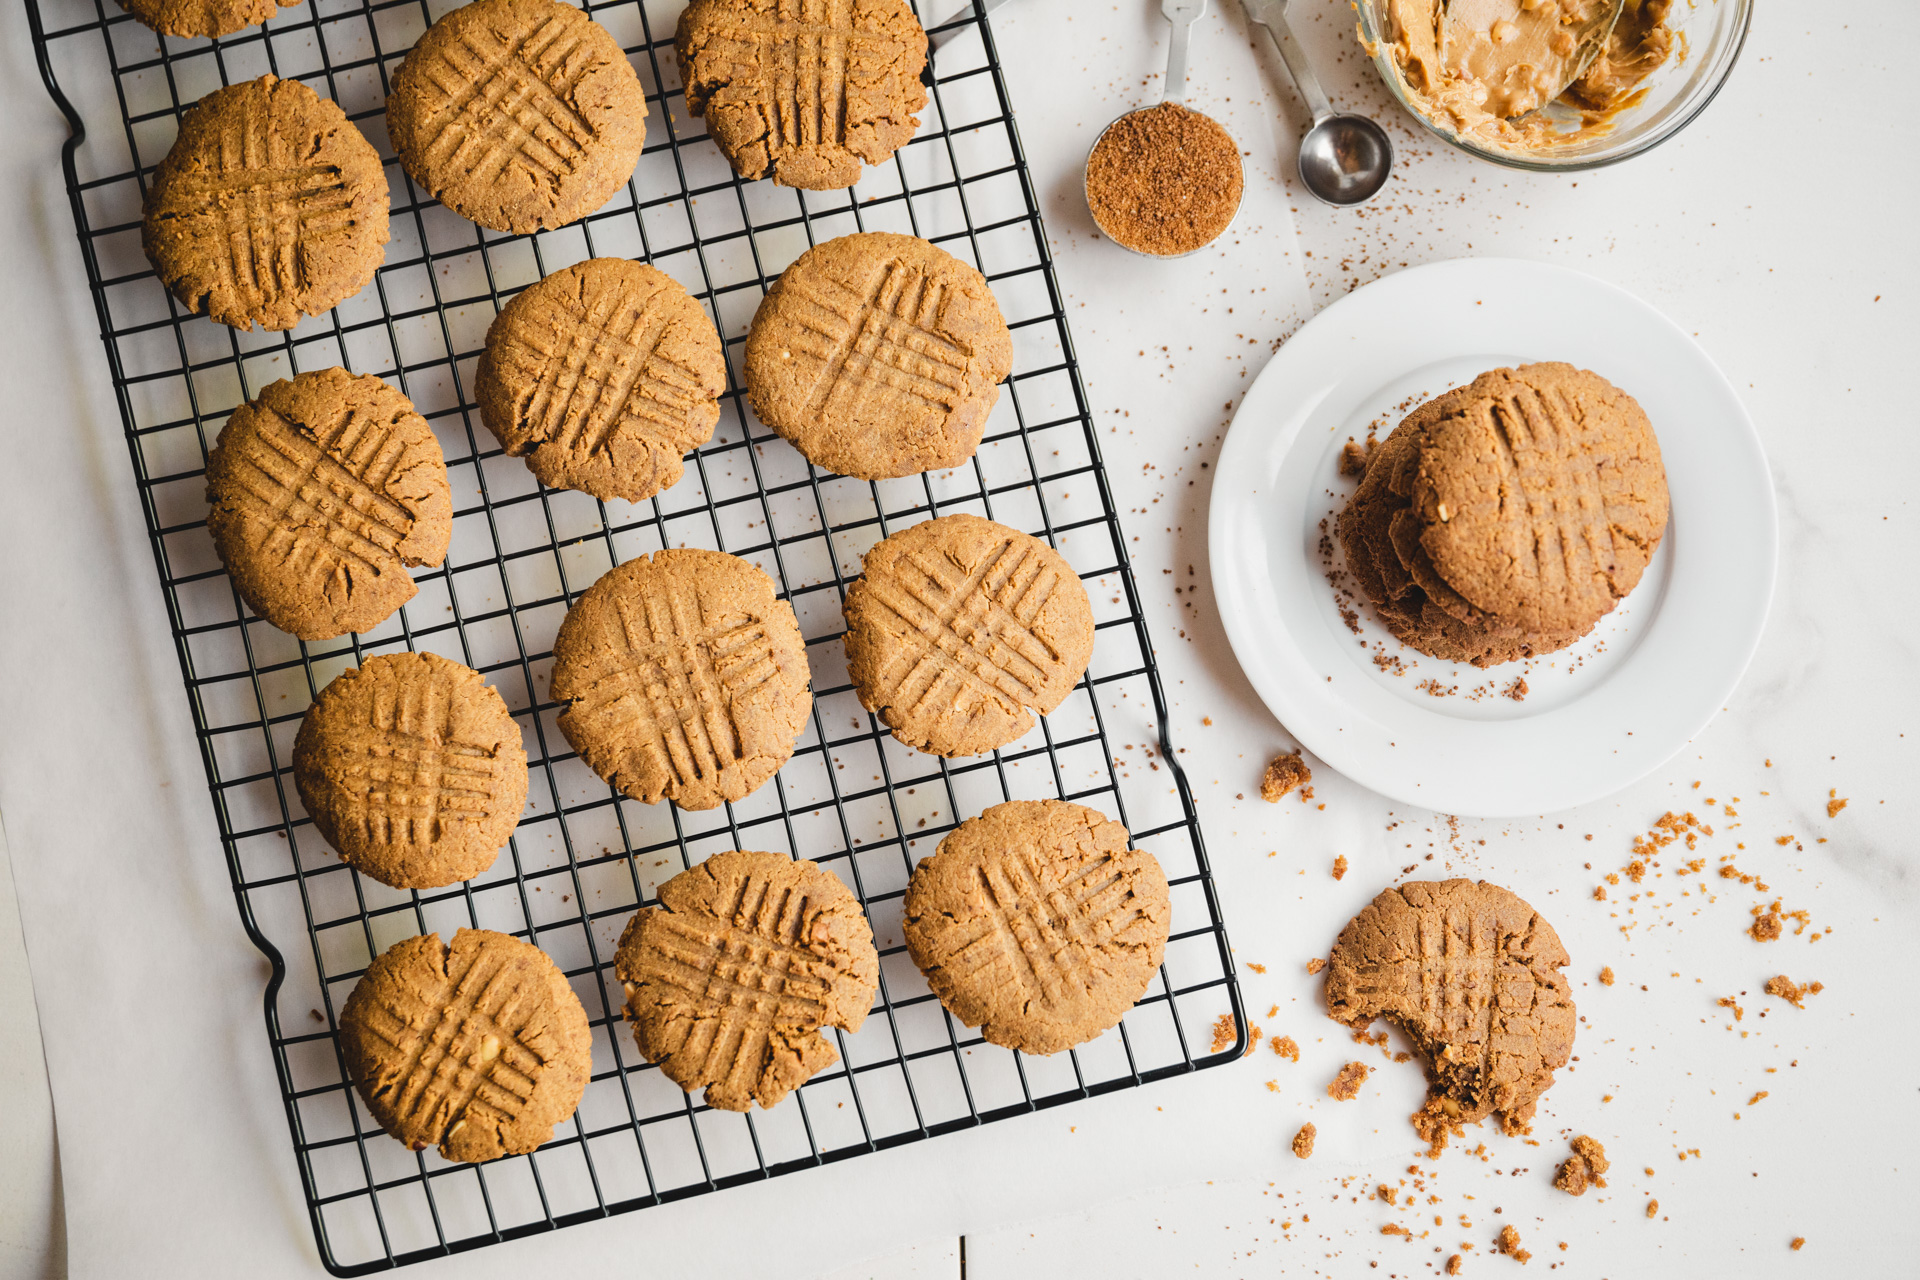 xnd-pb-cookie-4.jpg